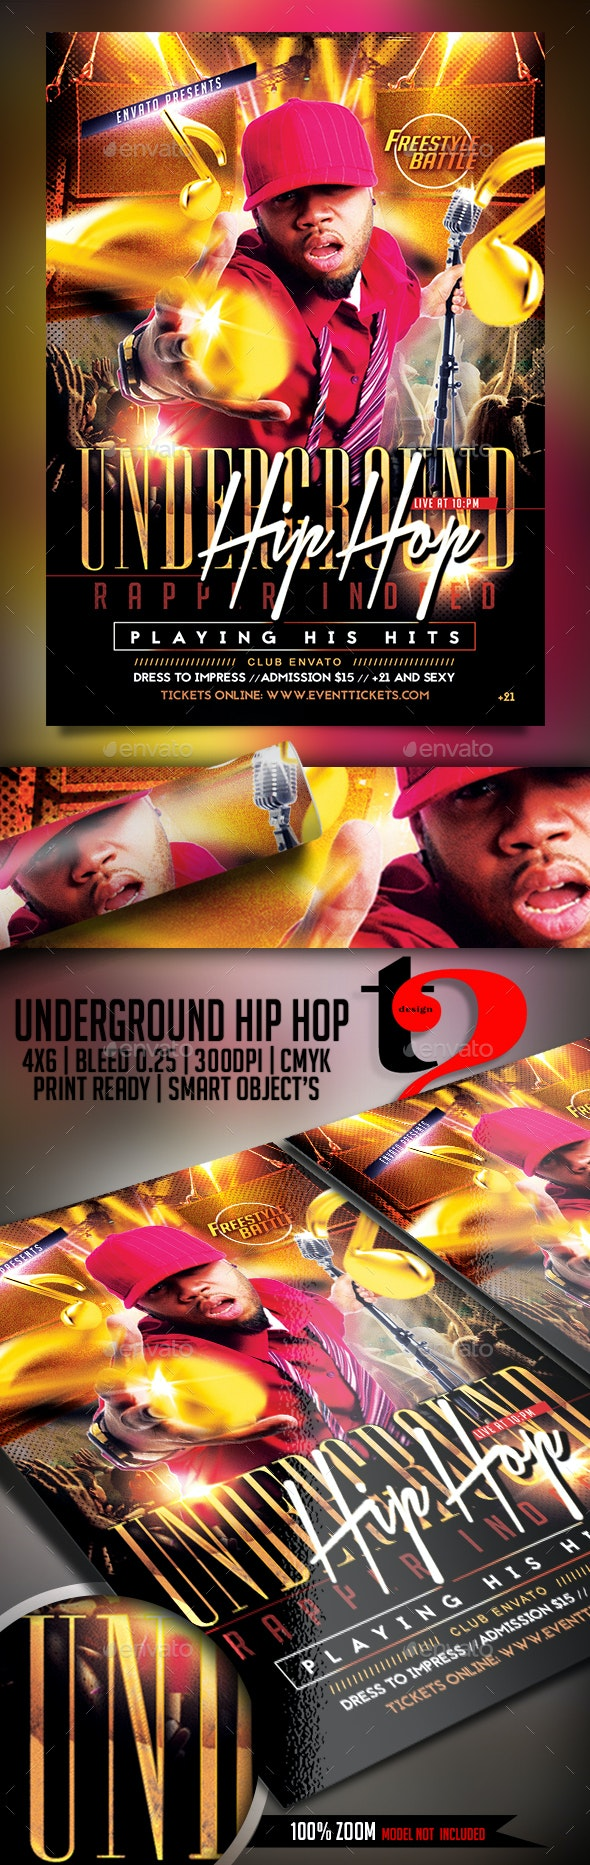 Underground Hip Hop Flyer - Clubs & Parties Events